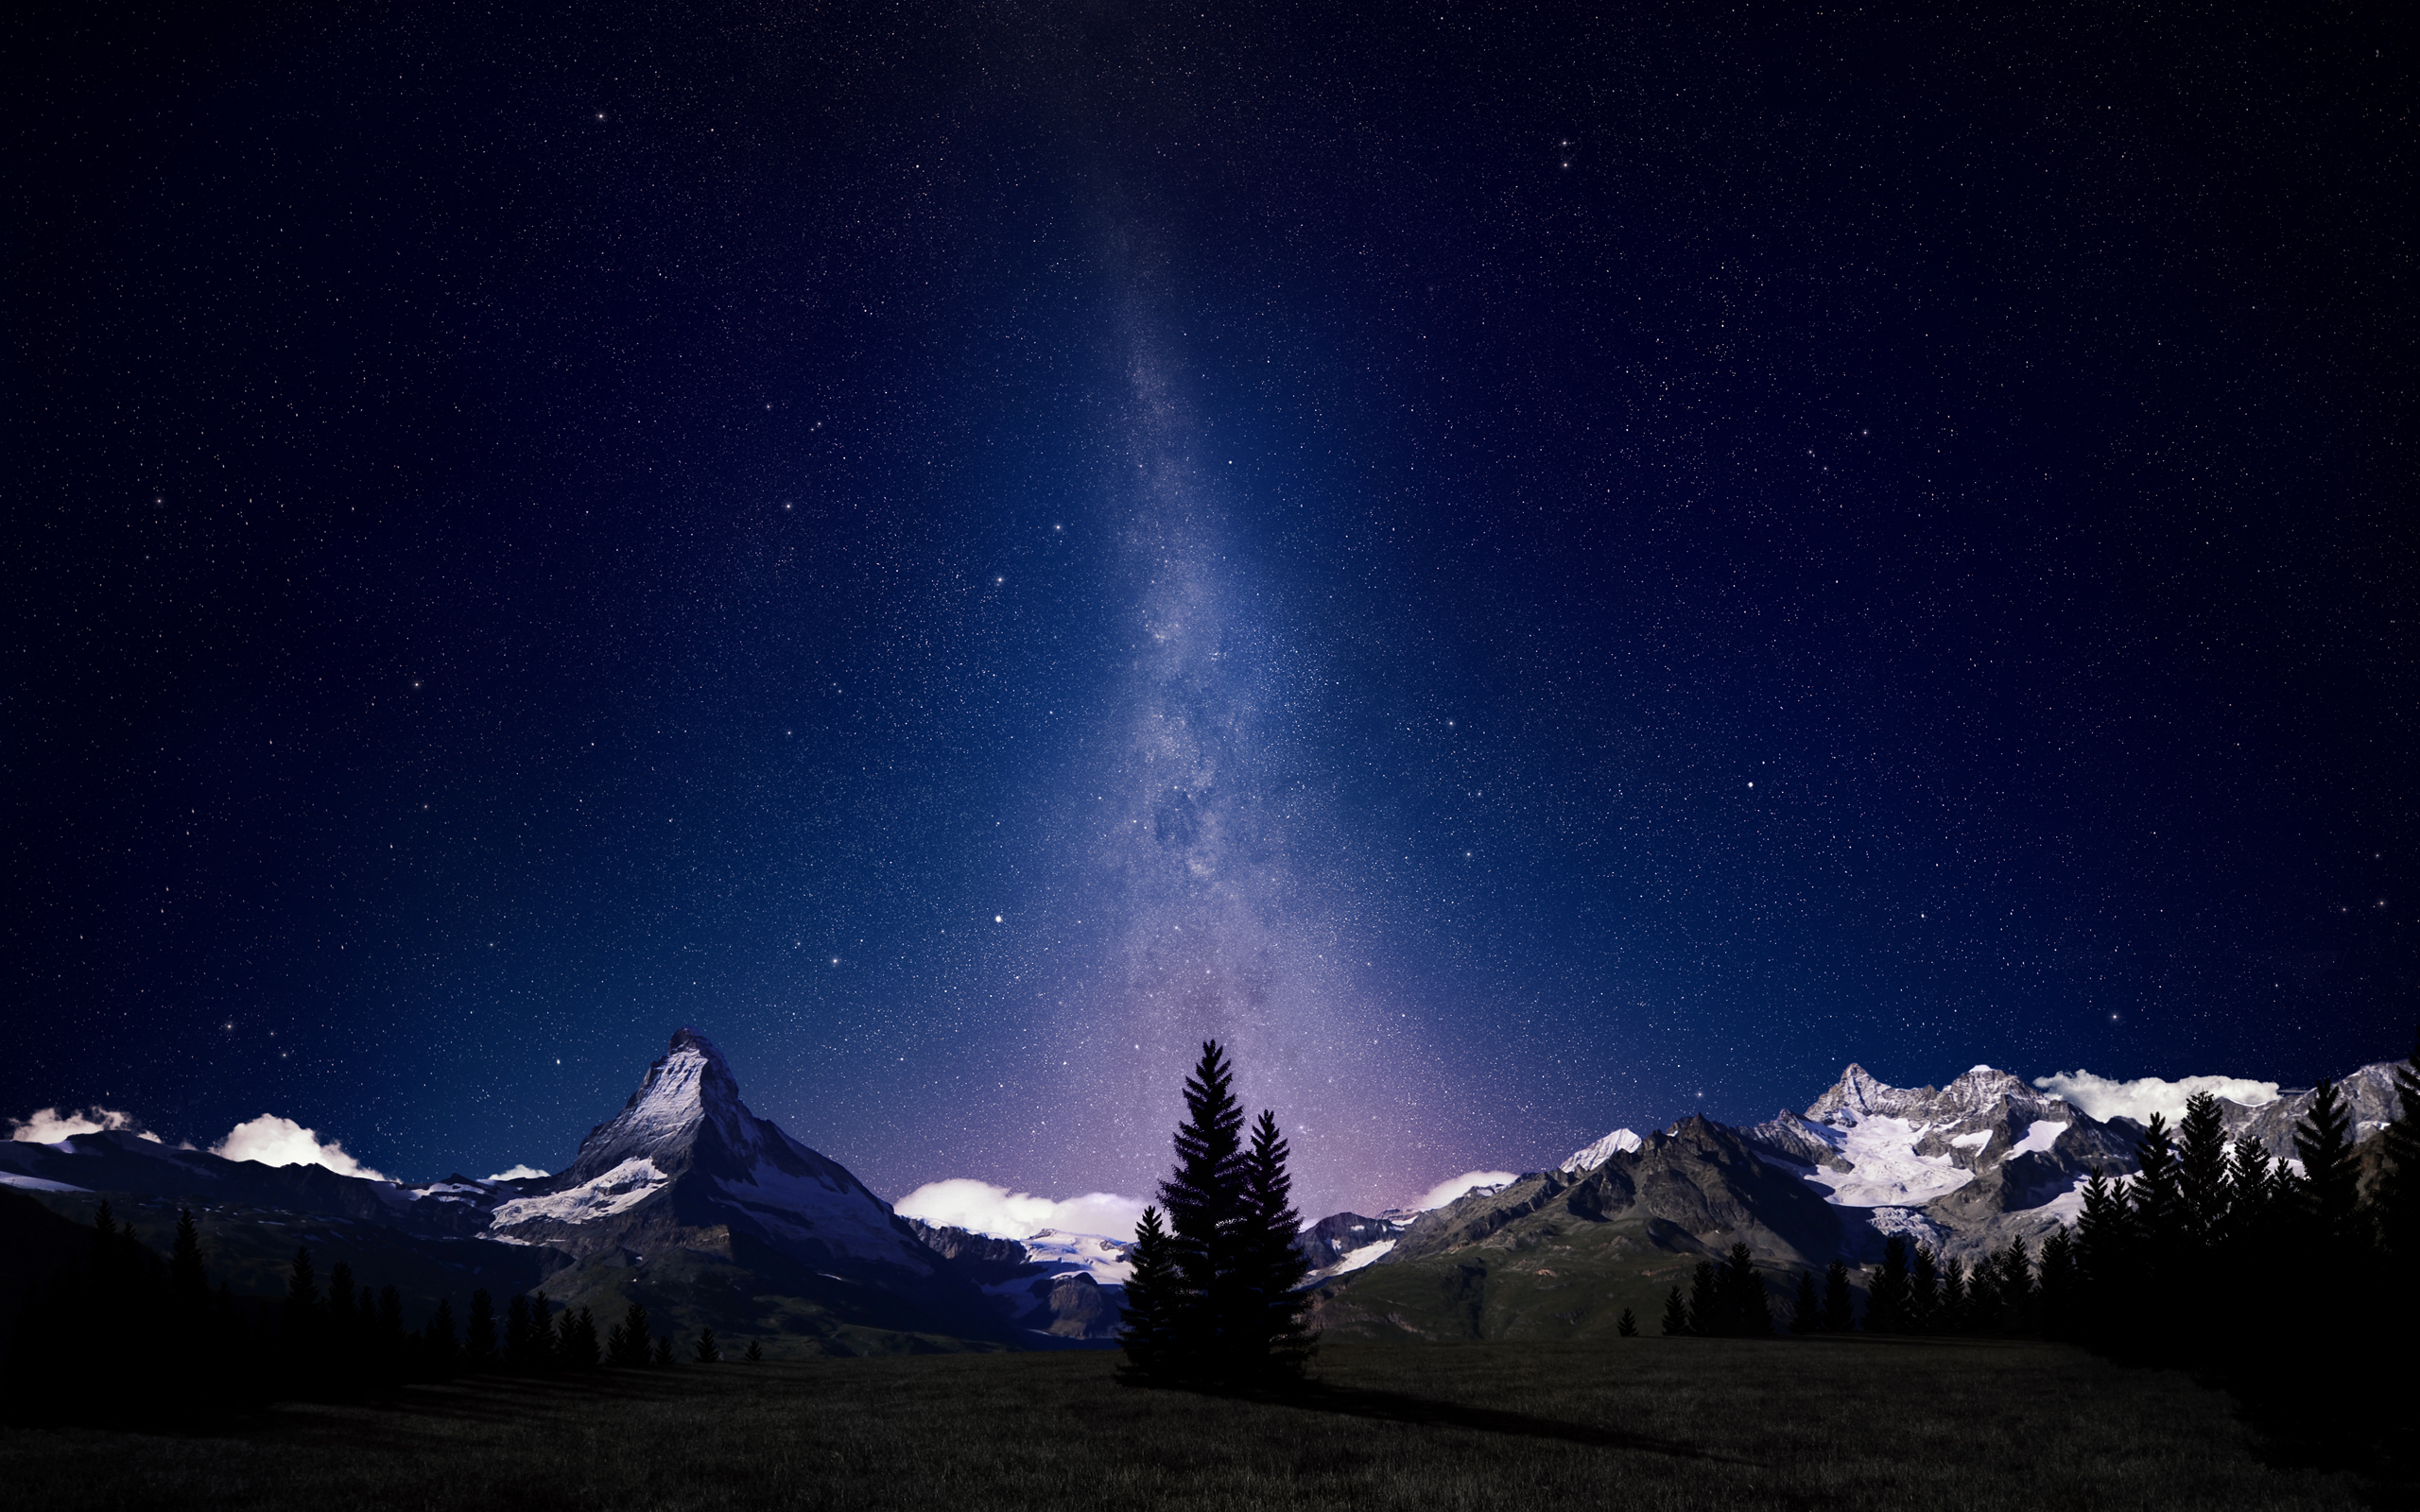 Swiss Alps Night Sky Wallpapers HD Wallpapers 2560x1600